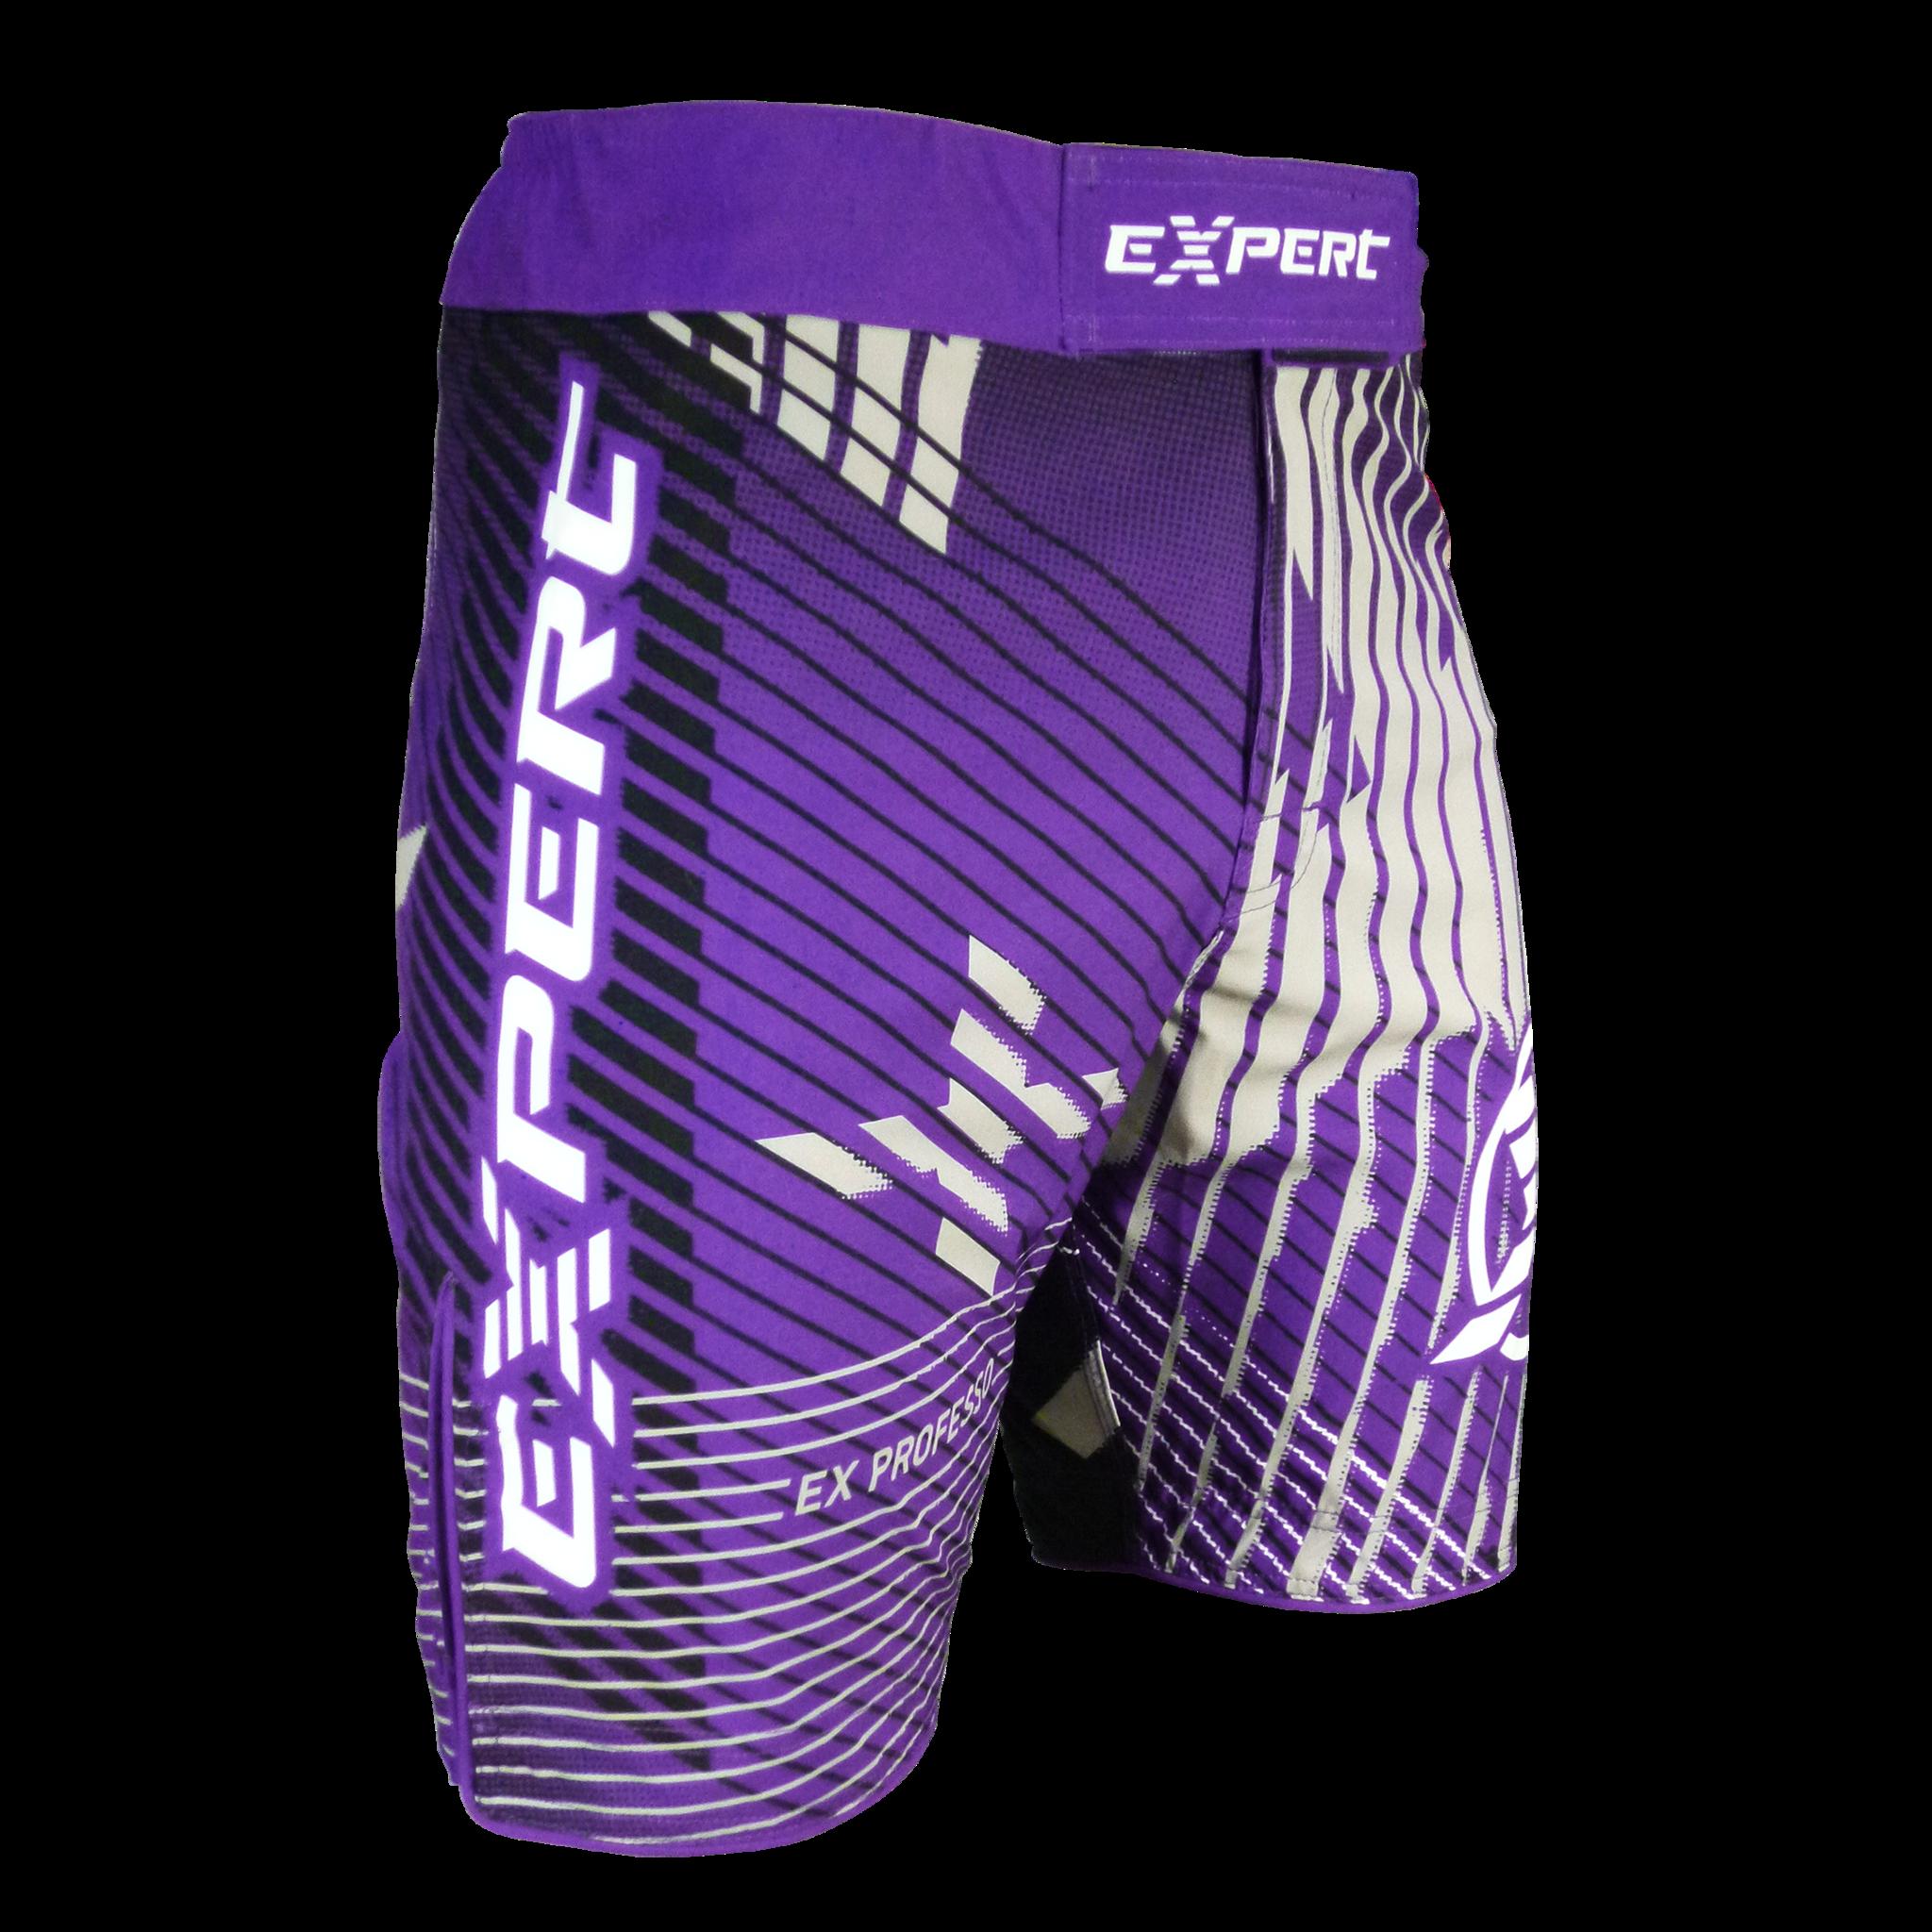 Шорты ММА Fight Expert Cross Фиолетовый/Серый Flamma